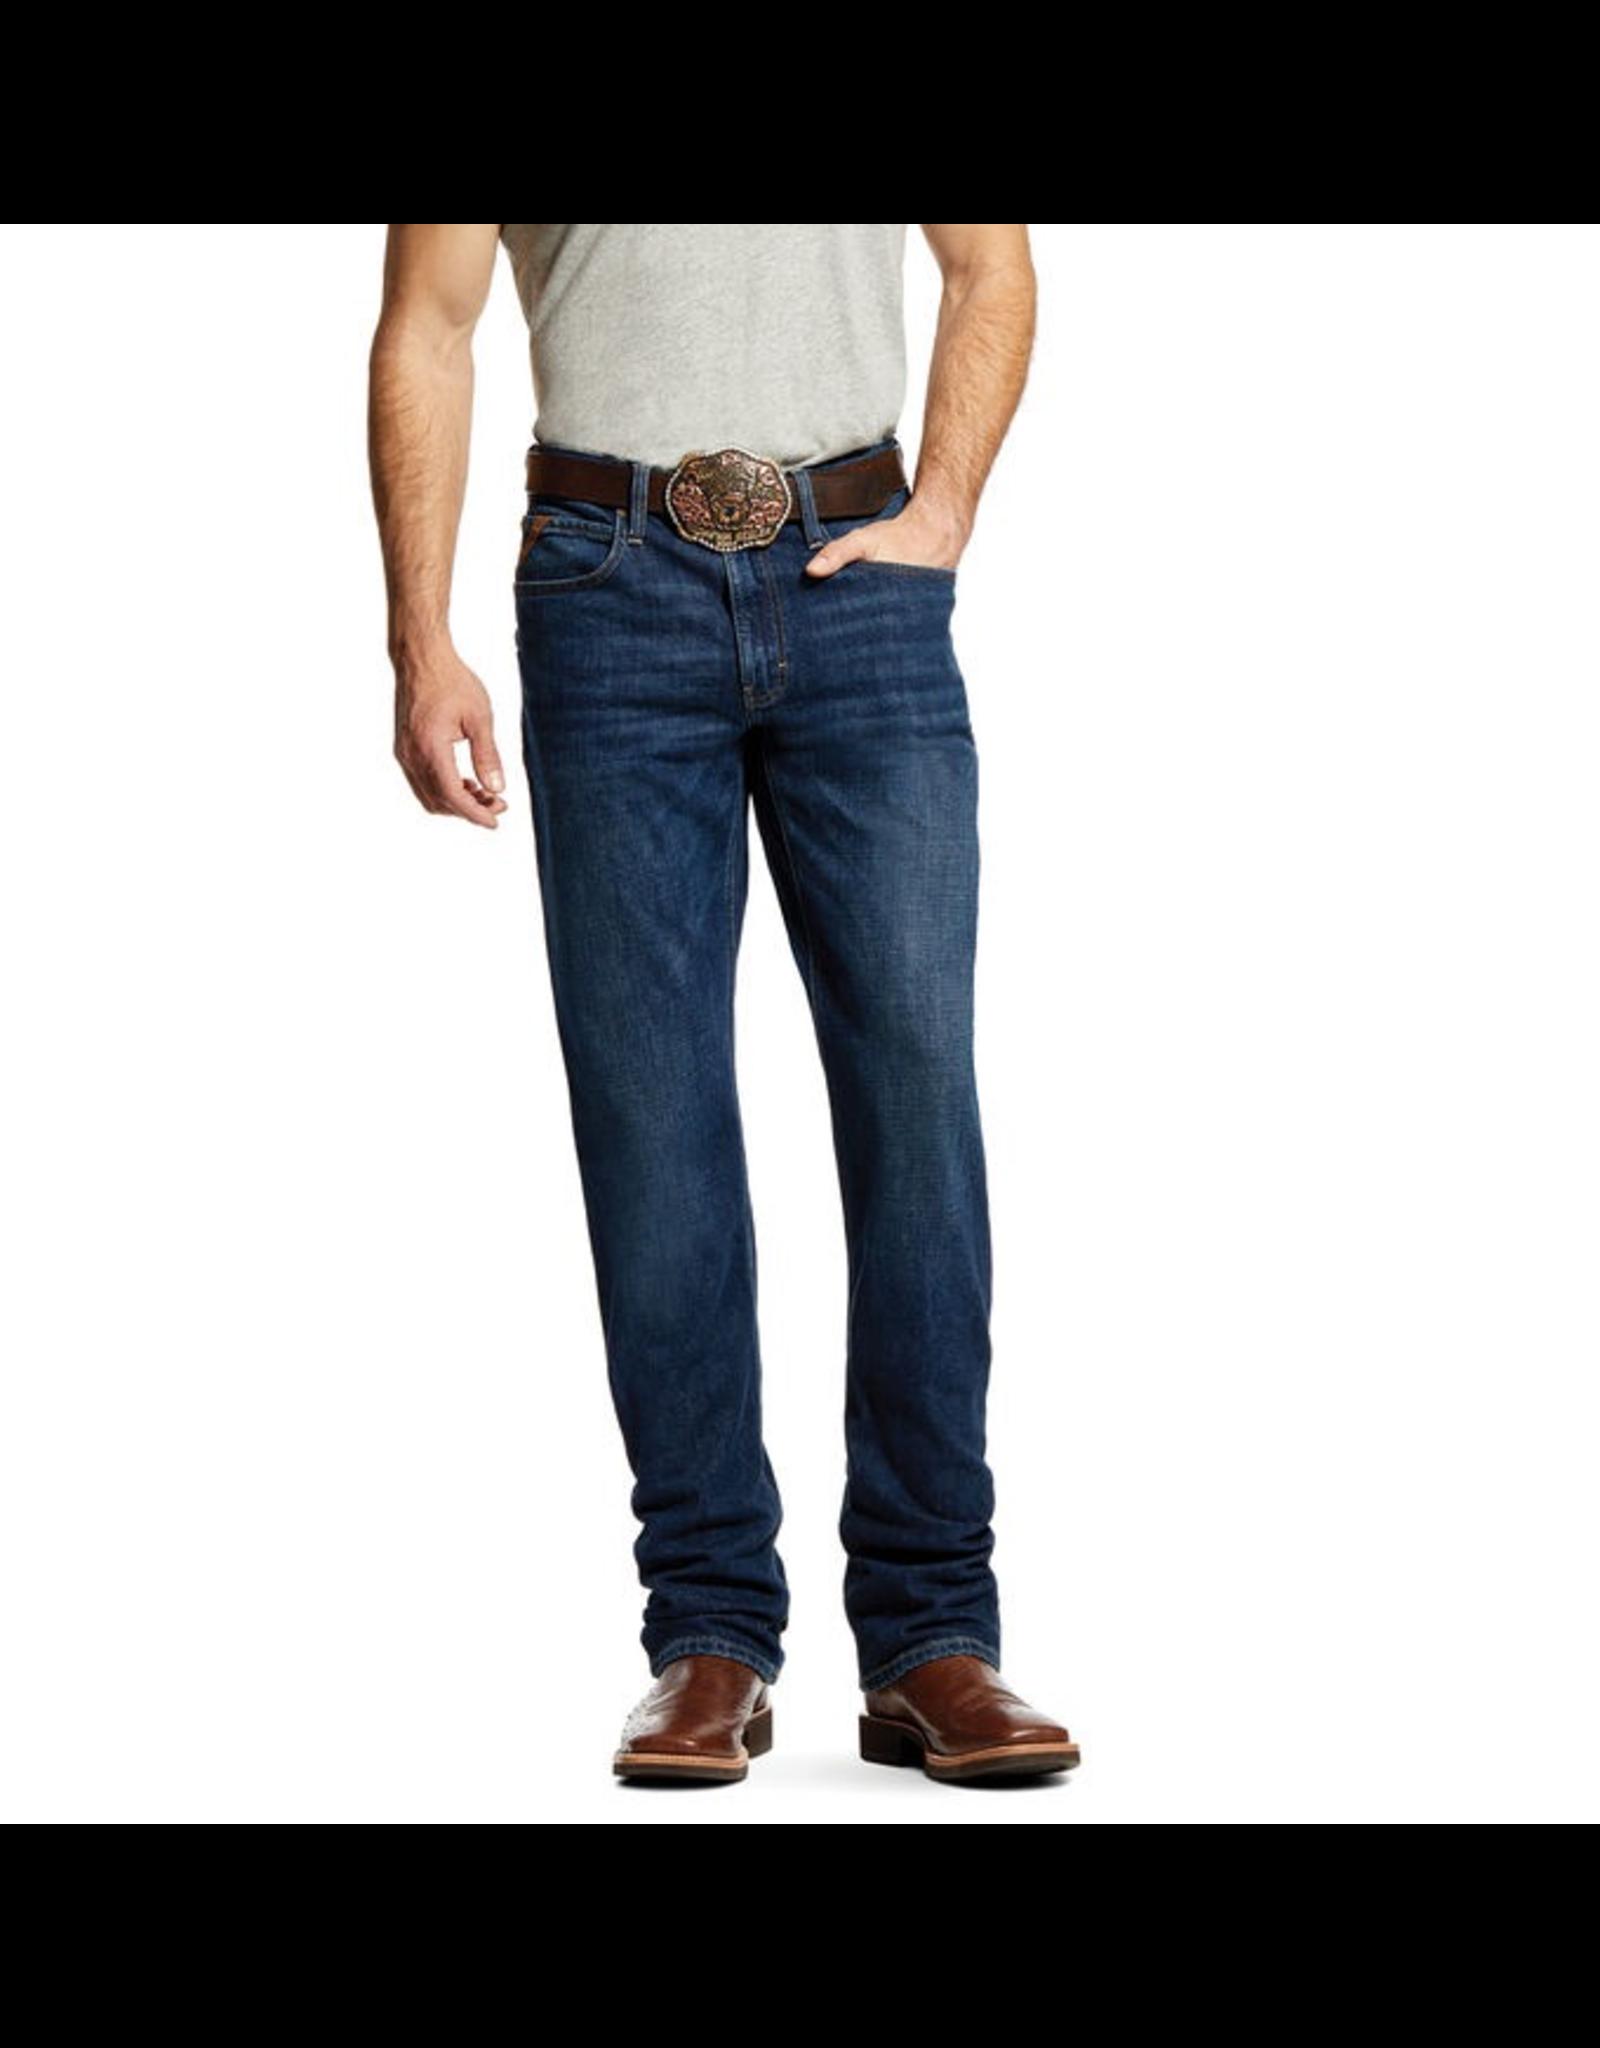 Jeans-Men Ariat M1 10029008 Slim Straight Stretch